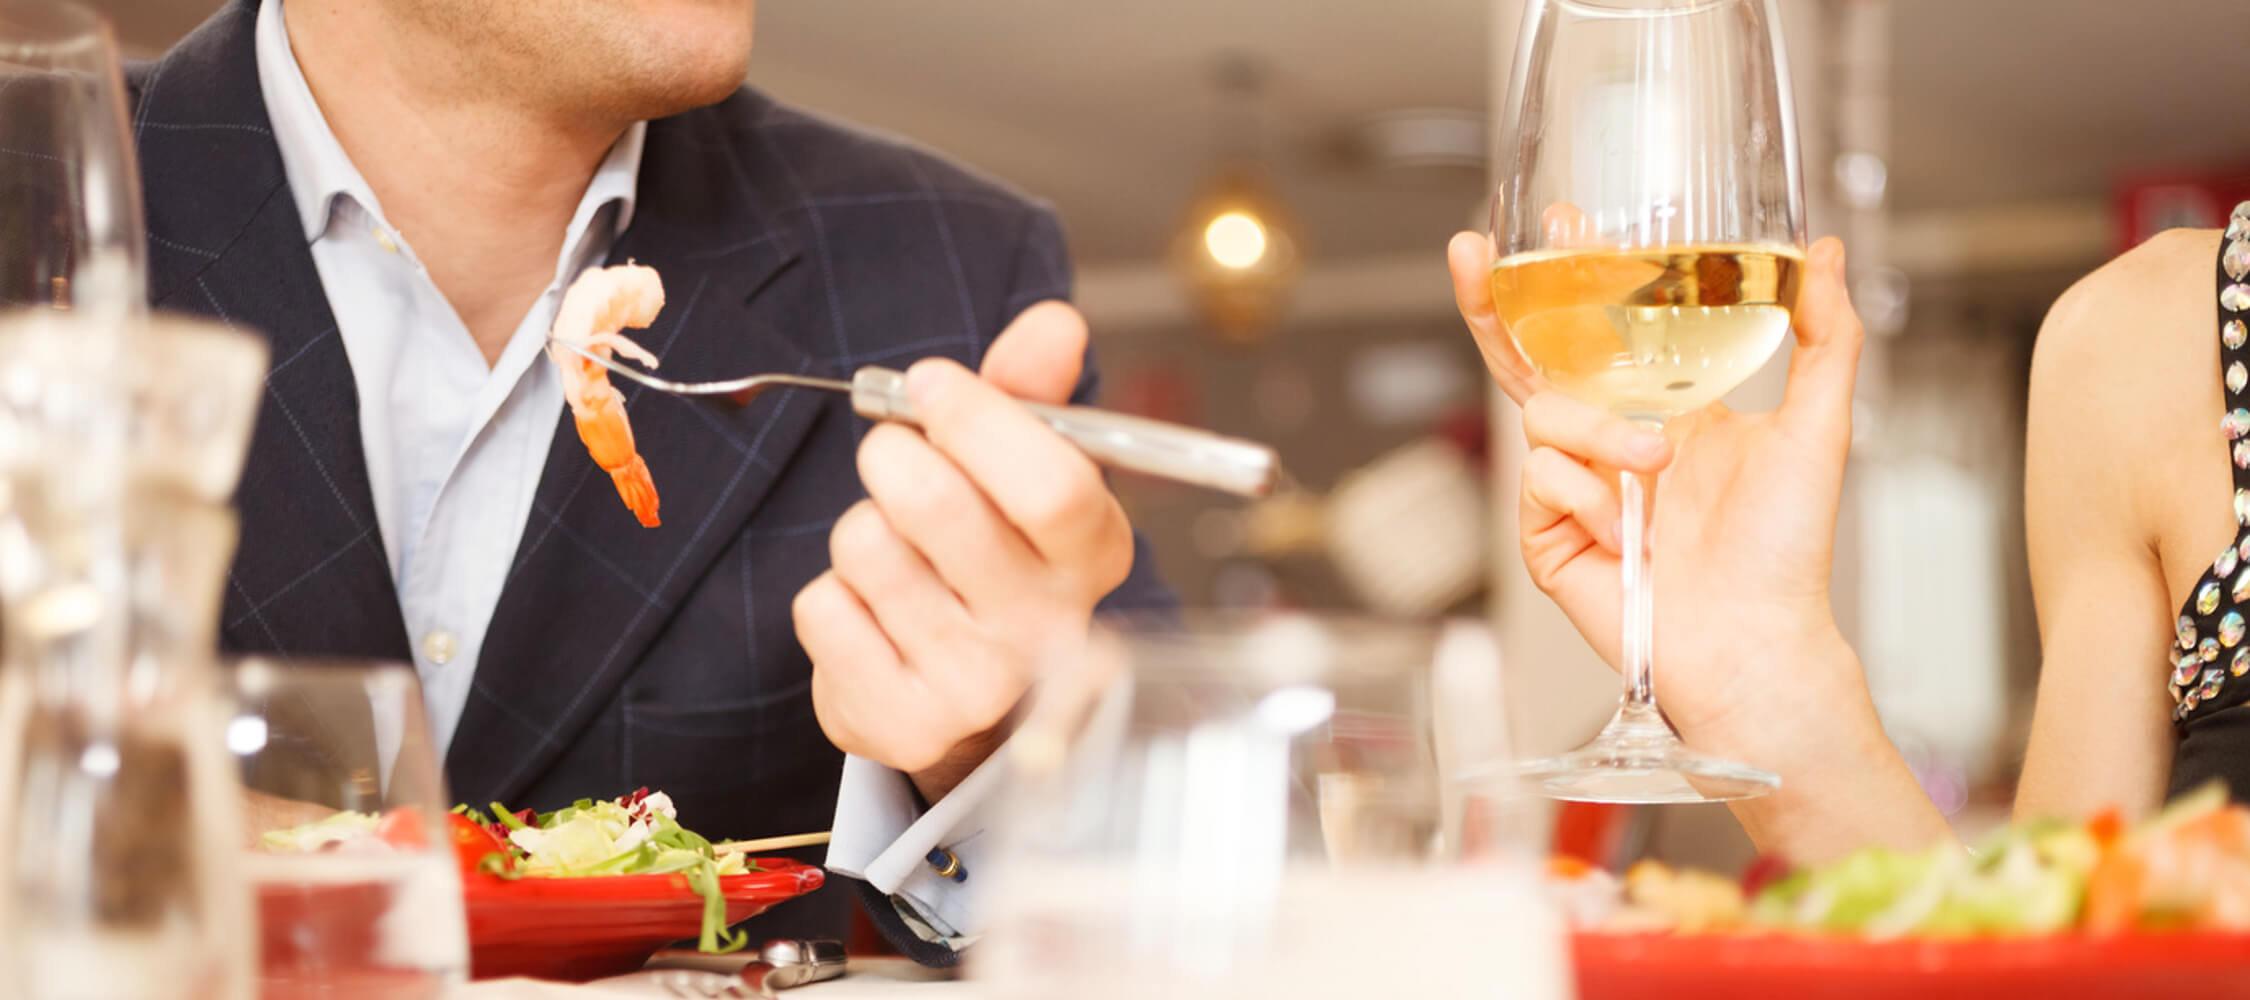 Restaurant_Tapas_Bar_The_Gallery_City_Hotel_Merano_Dinner_Paar_Menschen_Fisch_Salat_Wein_50983801_2250x1000